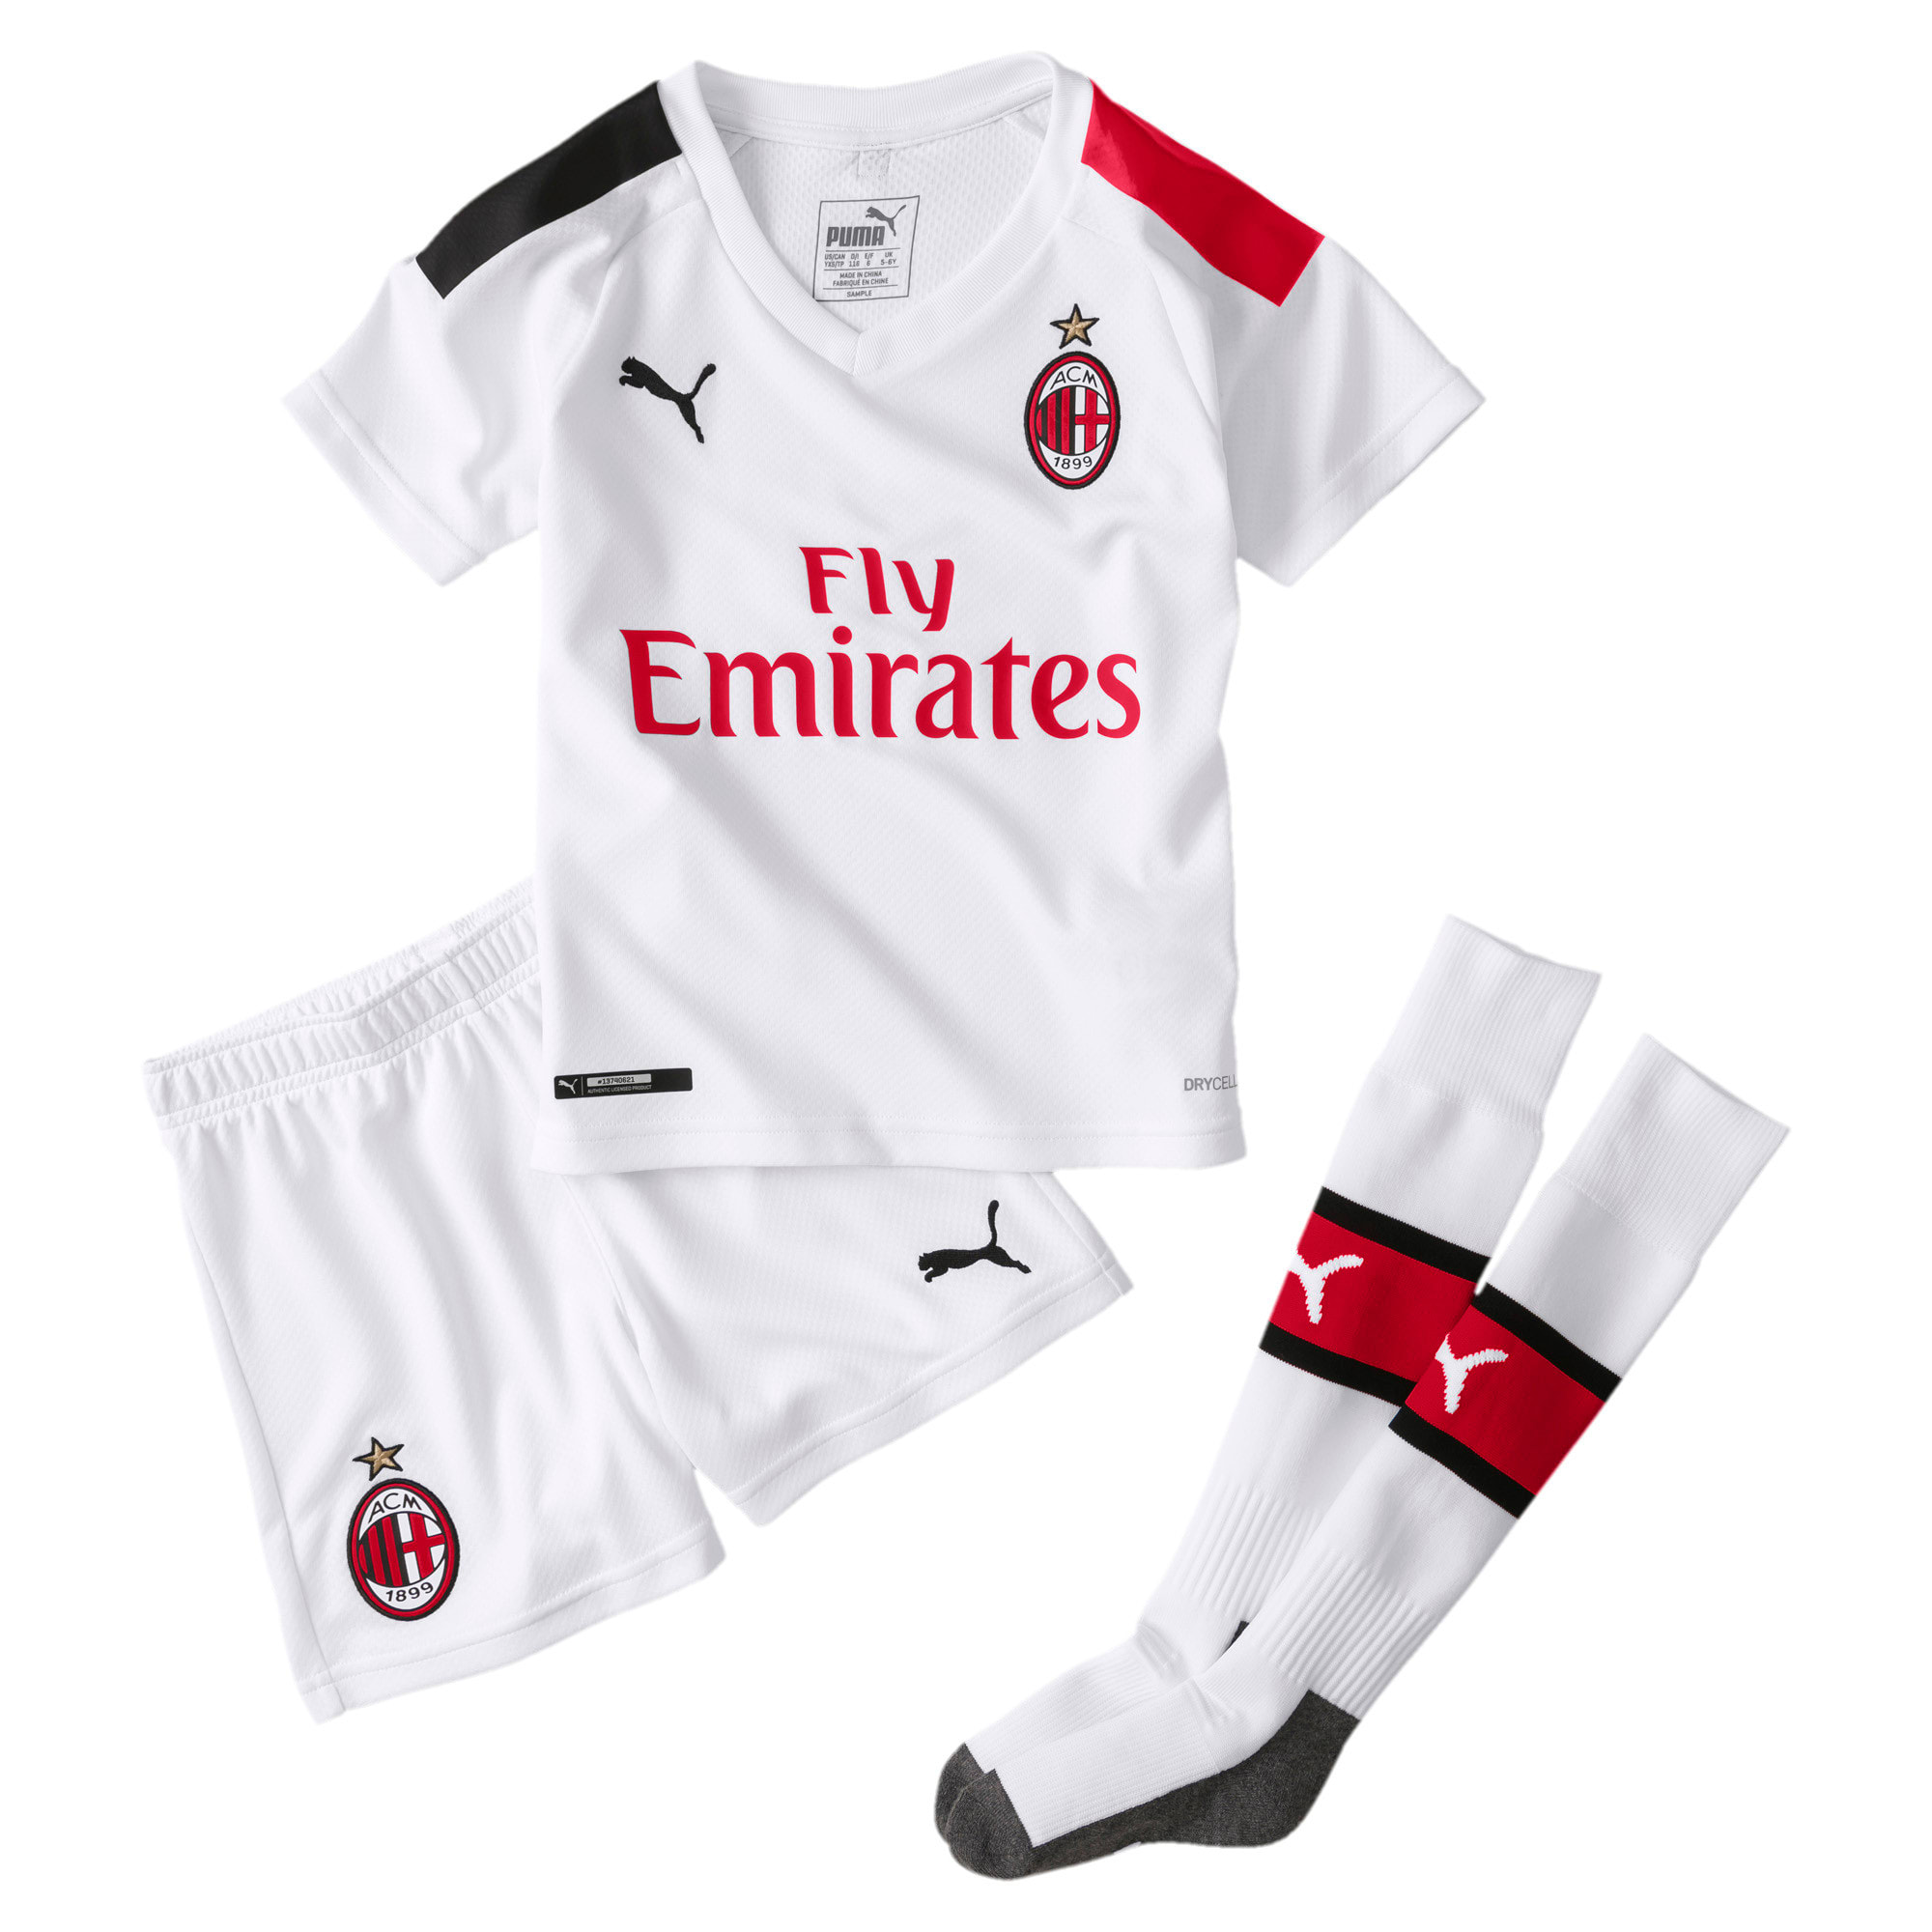 Thumbnail 1 of AC Milan Away Mini Kit, Puma White-Tango Red, medium